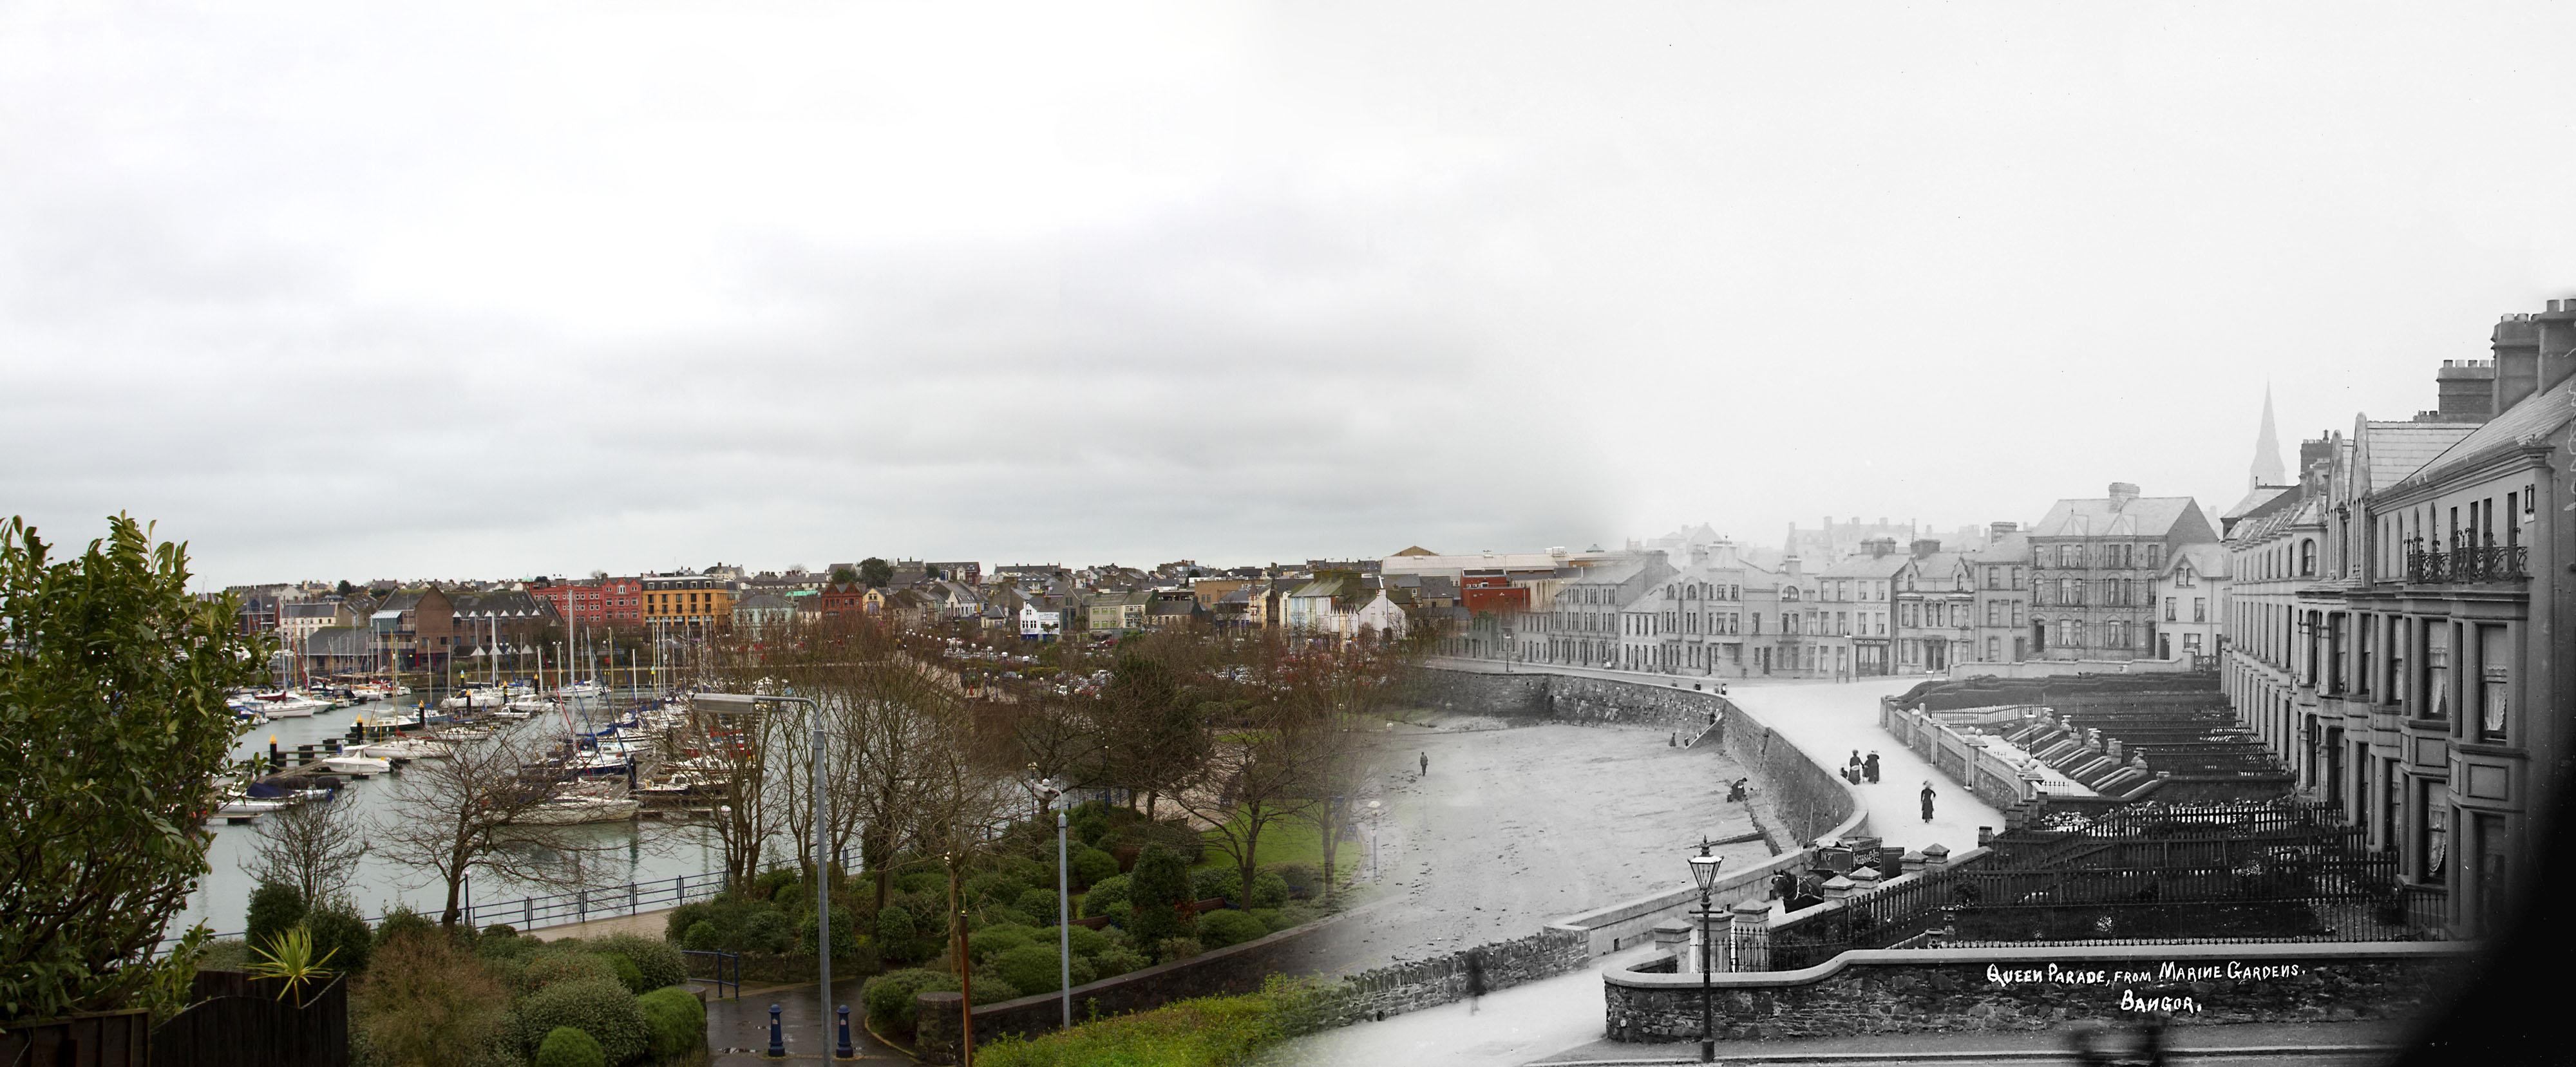 Bangor Marina, County Down